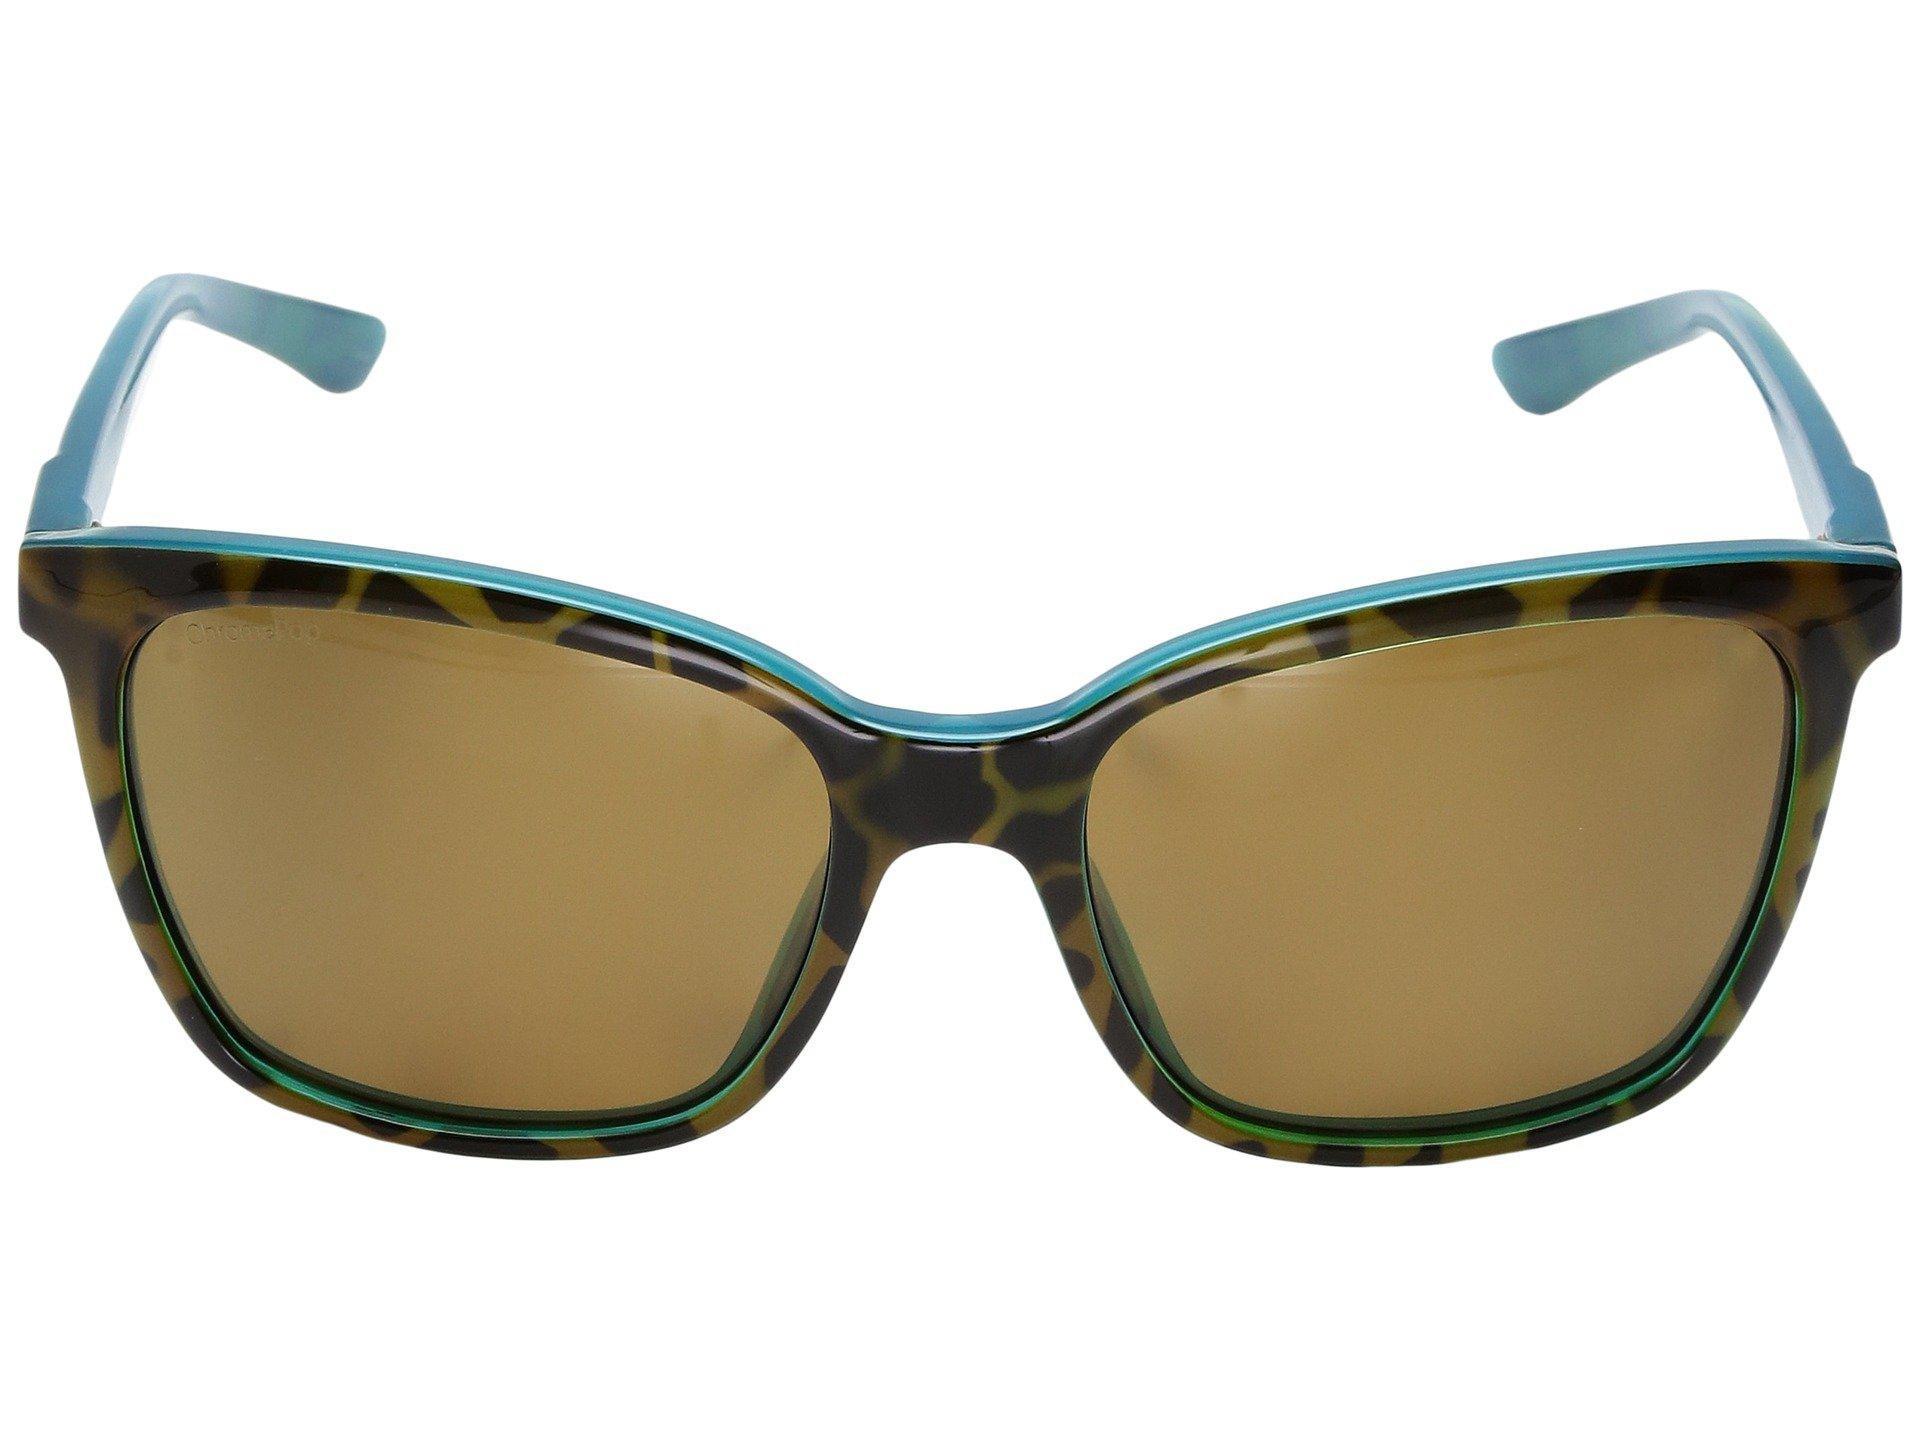 2837545a52 Smith Optics - Blue Colette (tortoise Marine chromapop Polarized Brown  Lens) Fashion Sunglasses. View fullscreen